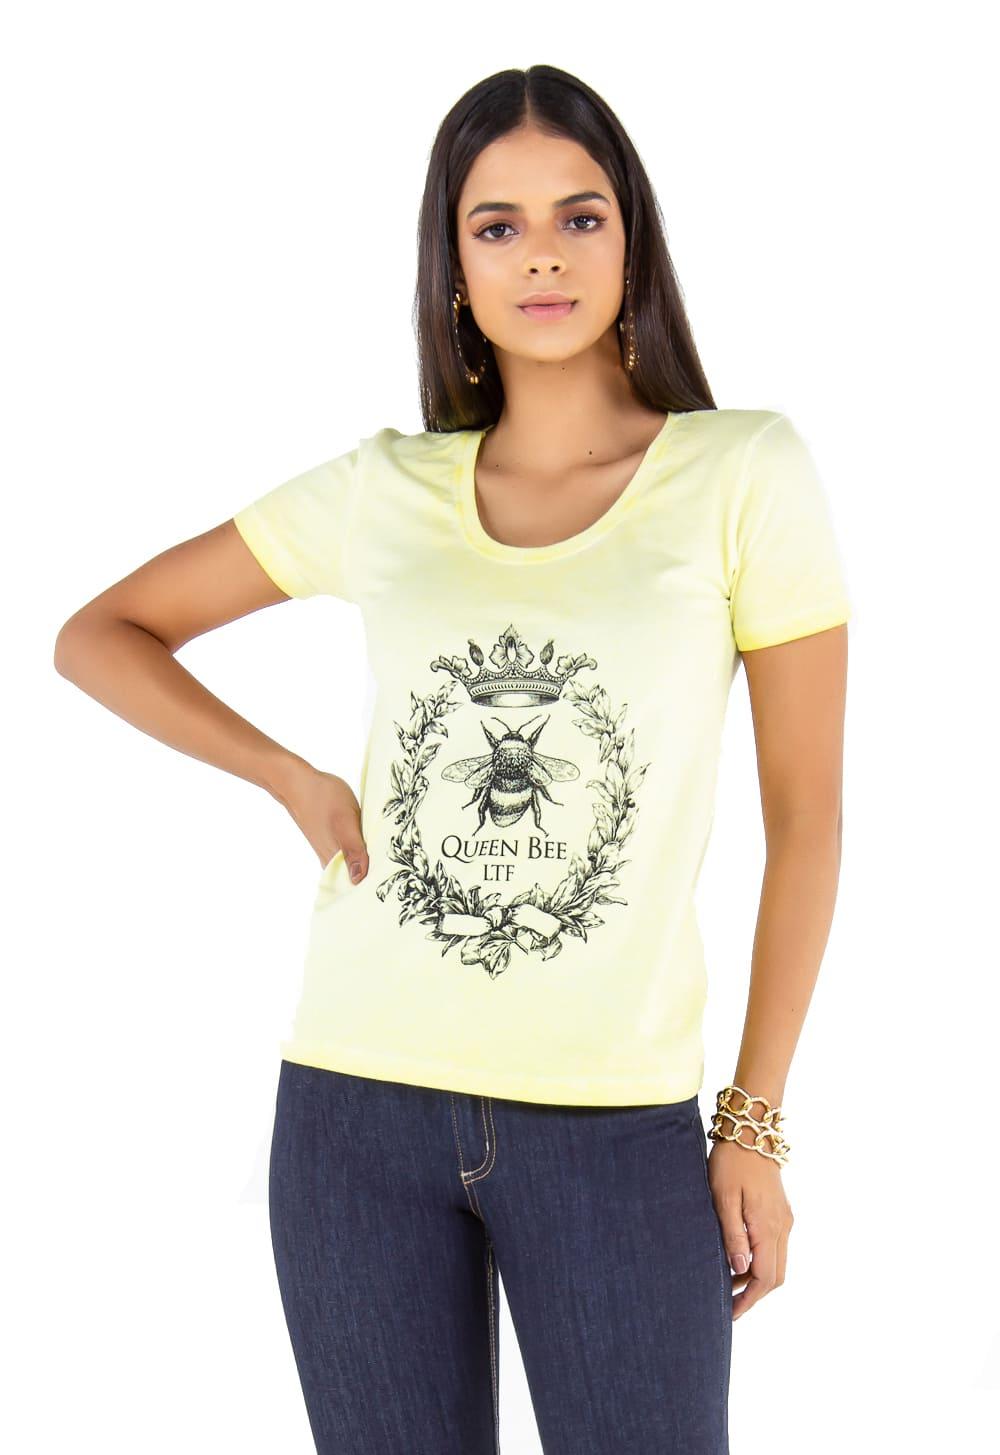 T-shirt Camiseta Feminina Latifundio Queen Bee